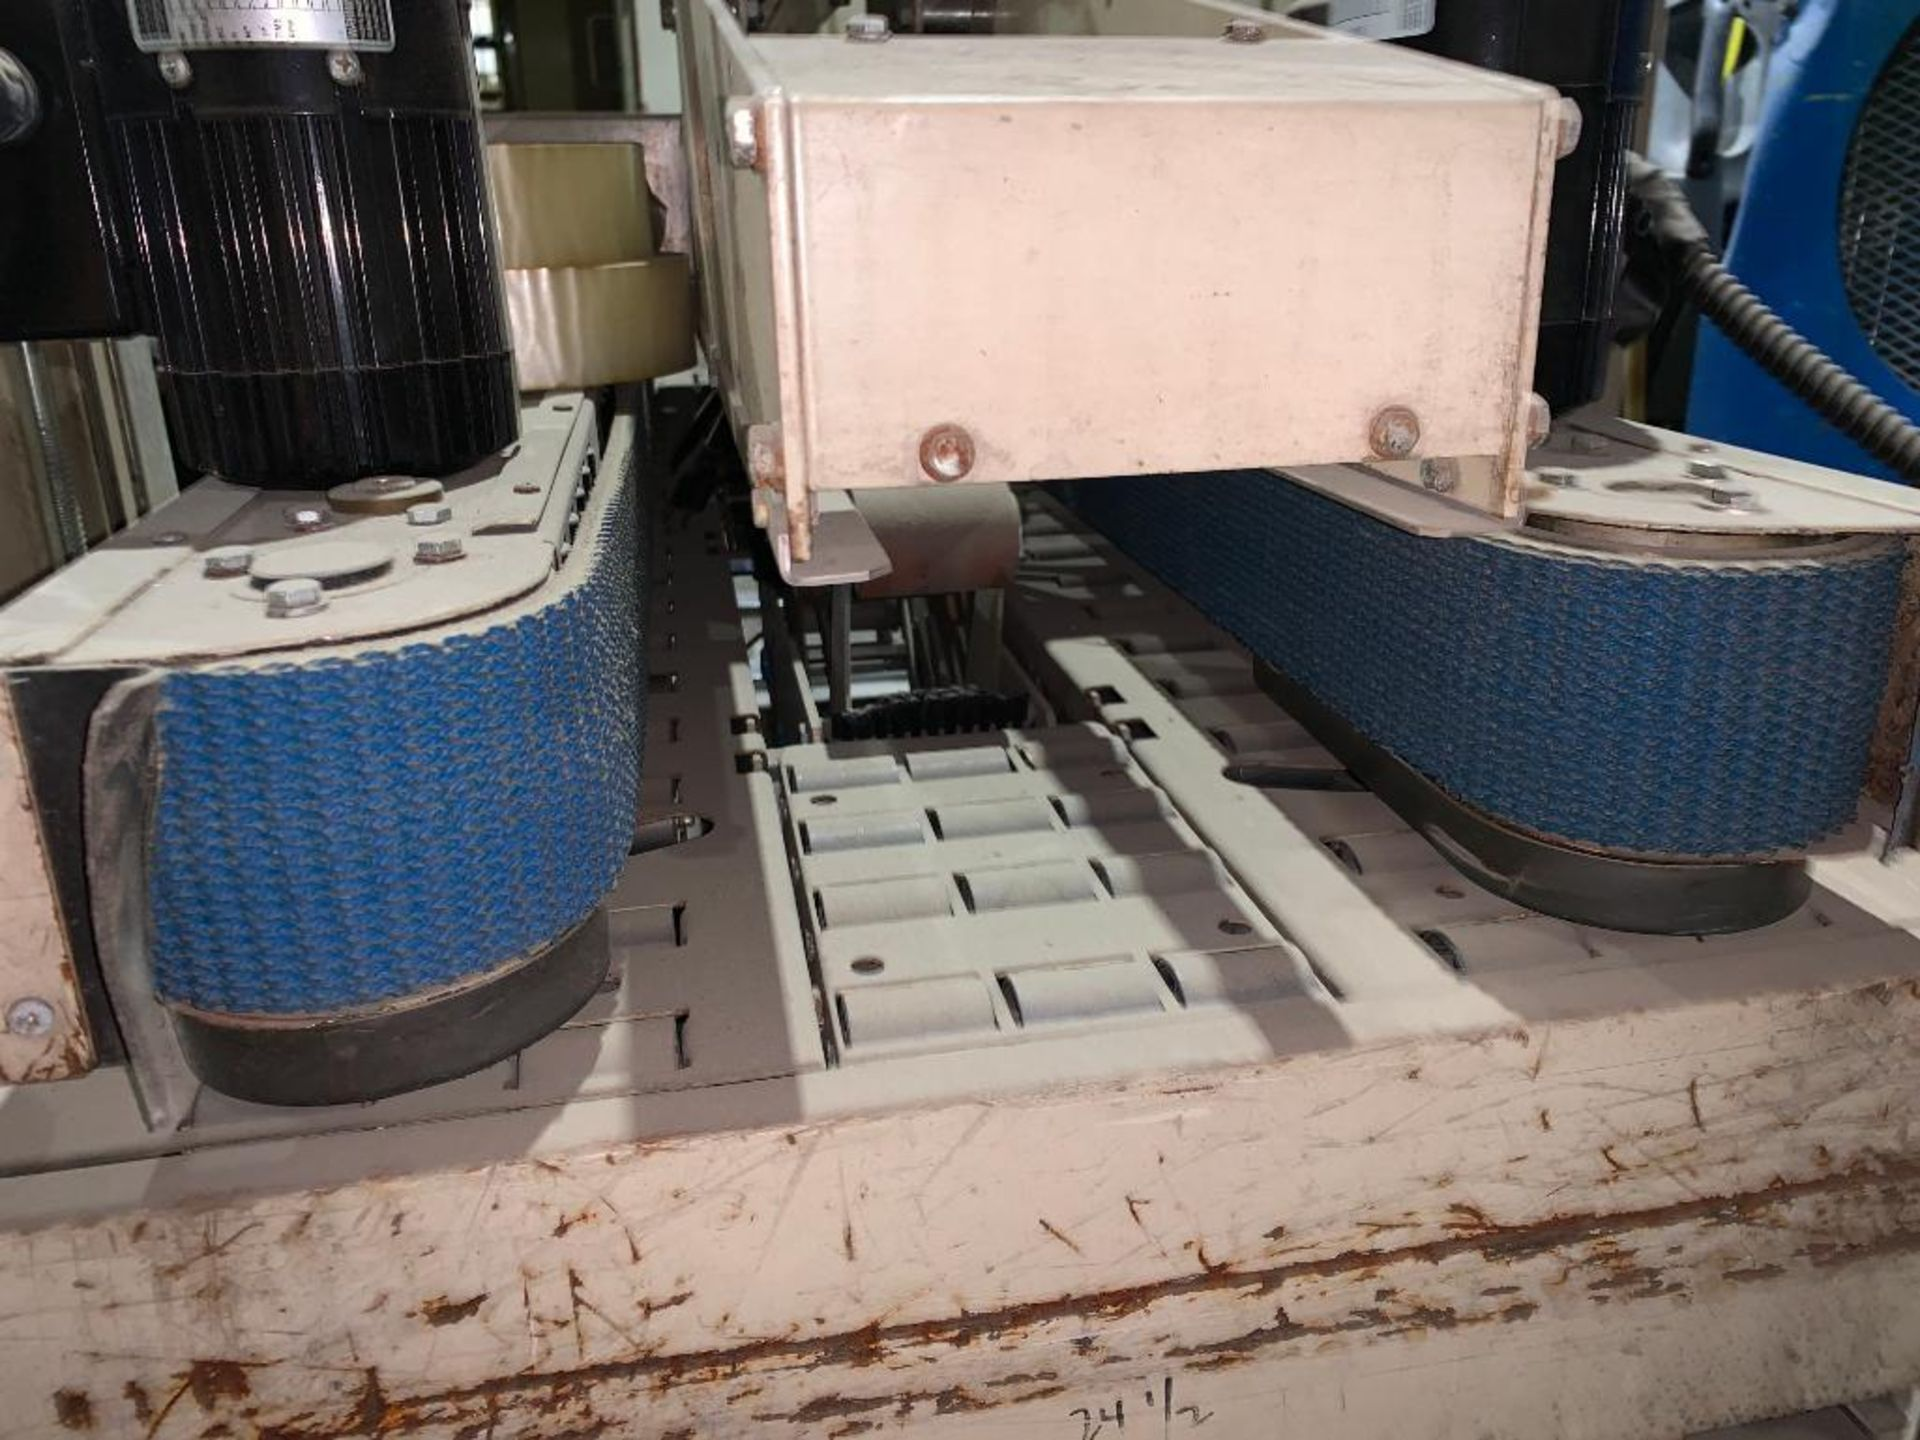 3M-Matic case taper - Image 8 of 15